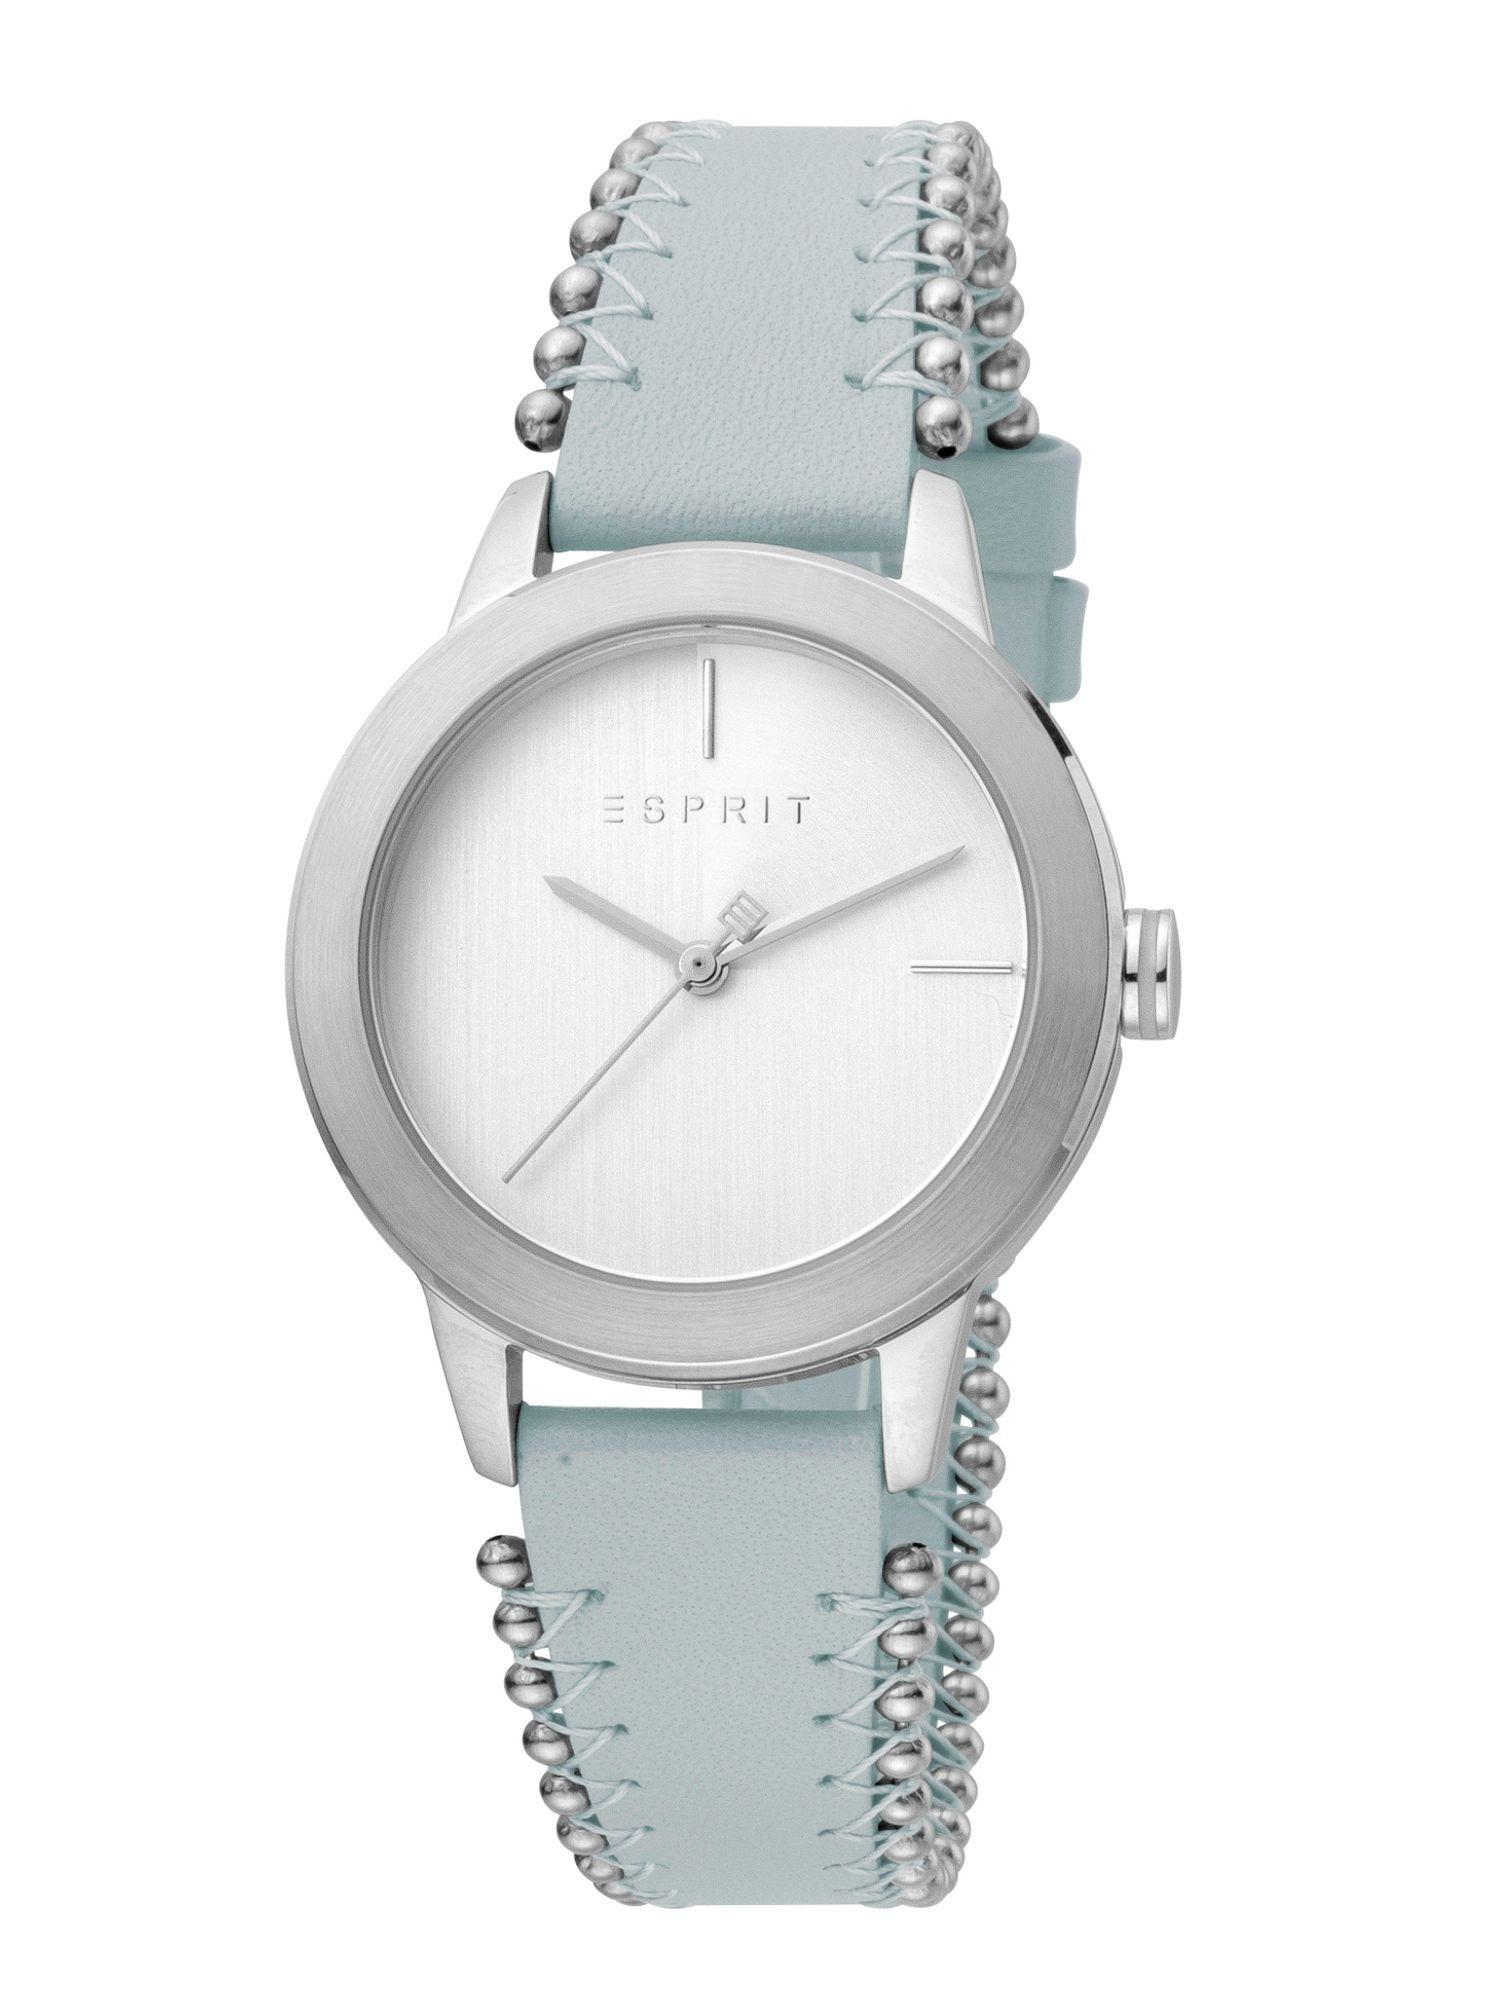 Esprit ES1L105L0035 Bloom Perls Uhr Damenuhr Lederarmband Blau